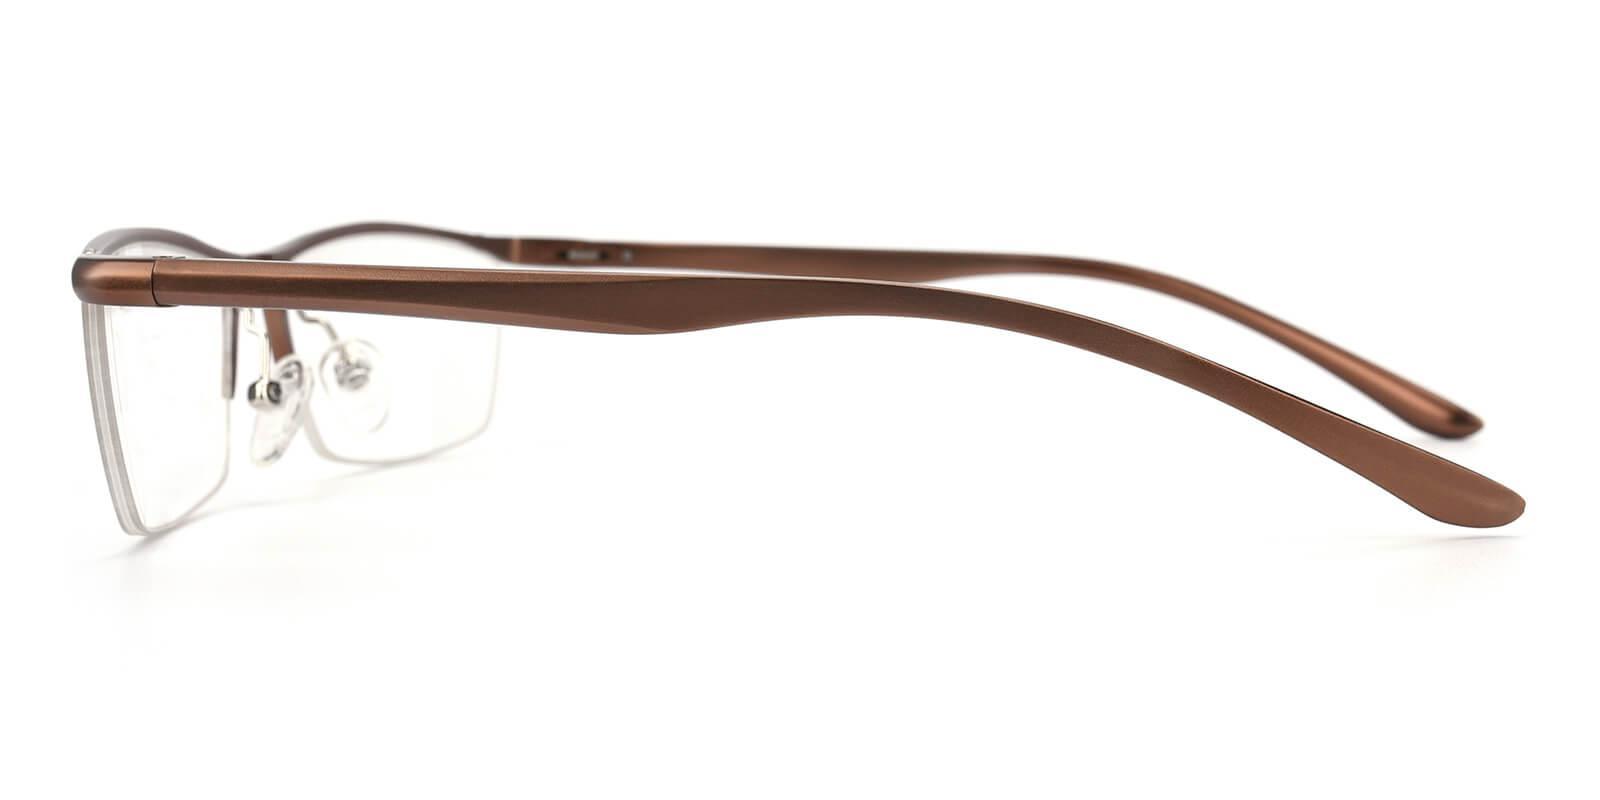 Vauseper-Brown-Rectangle-Metal-Eyeglasses-additional3